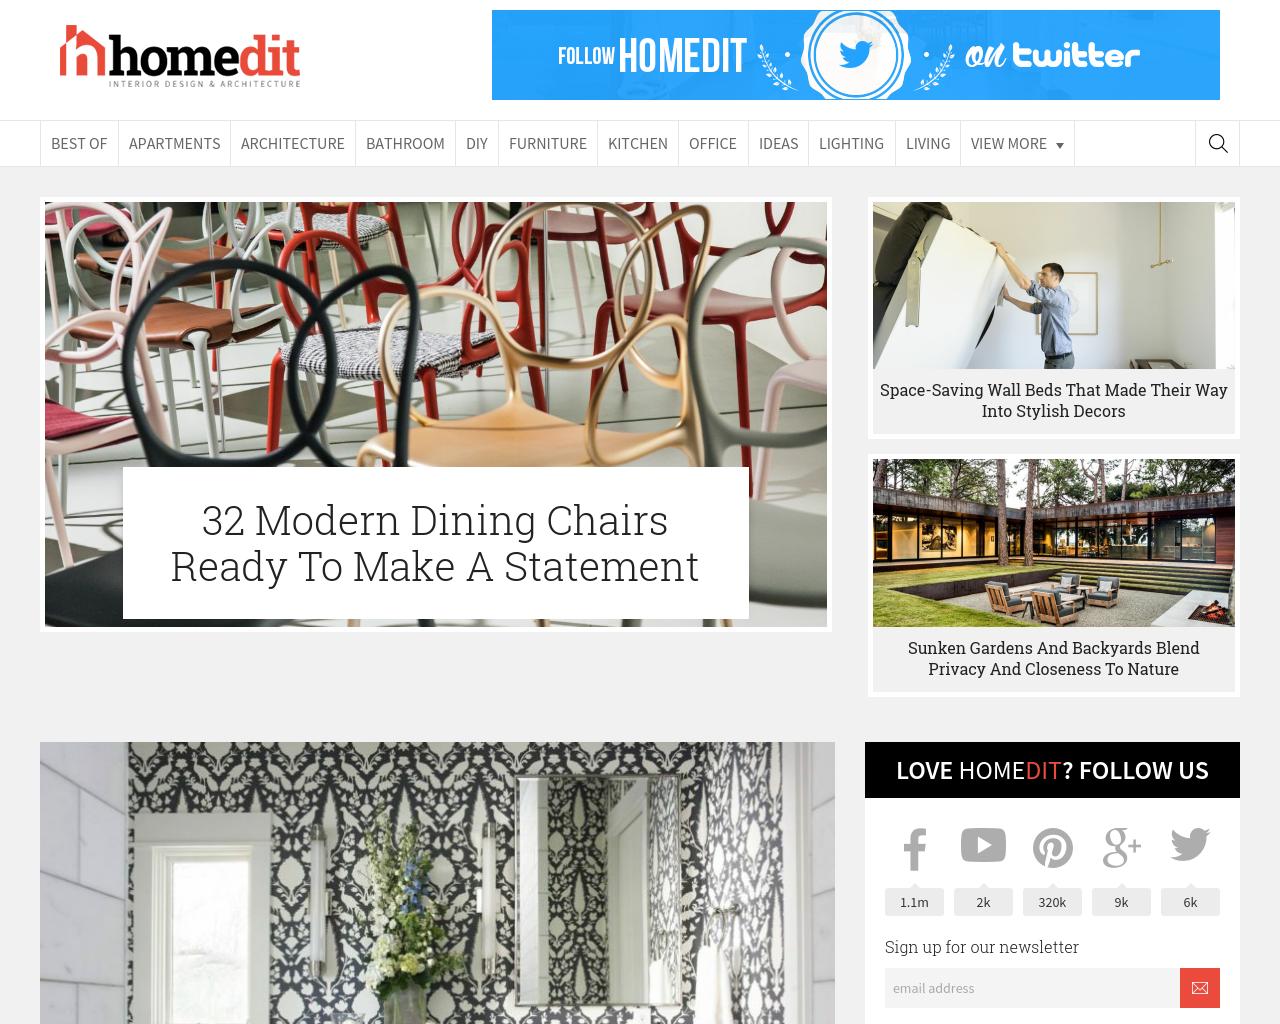 Homedit-Advertising-Reviews-Pricing